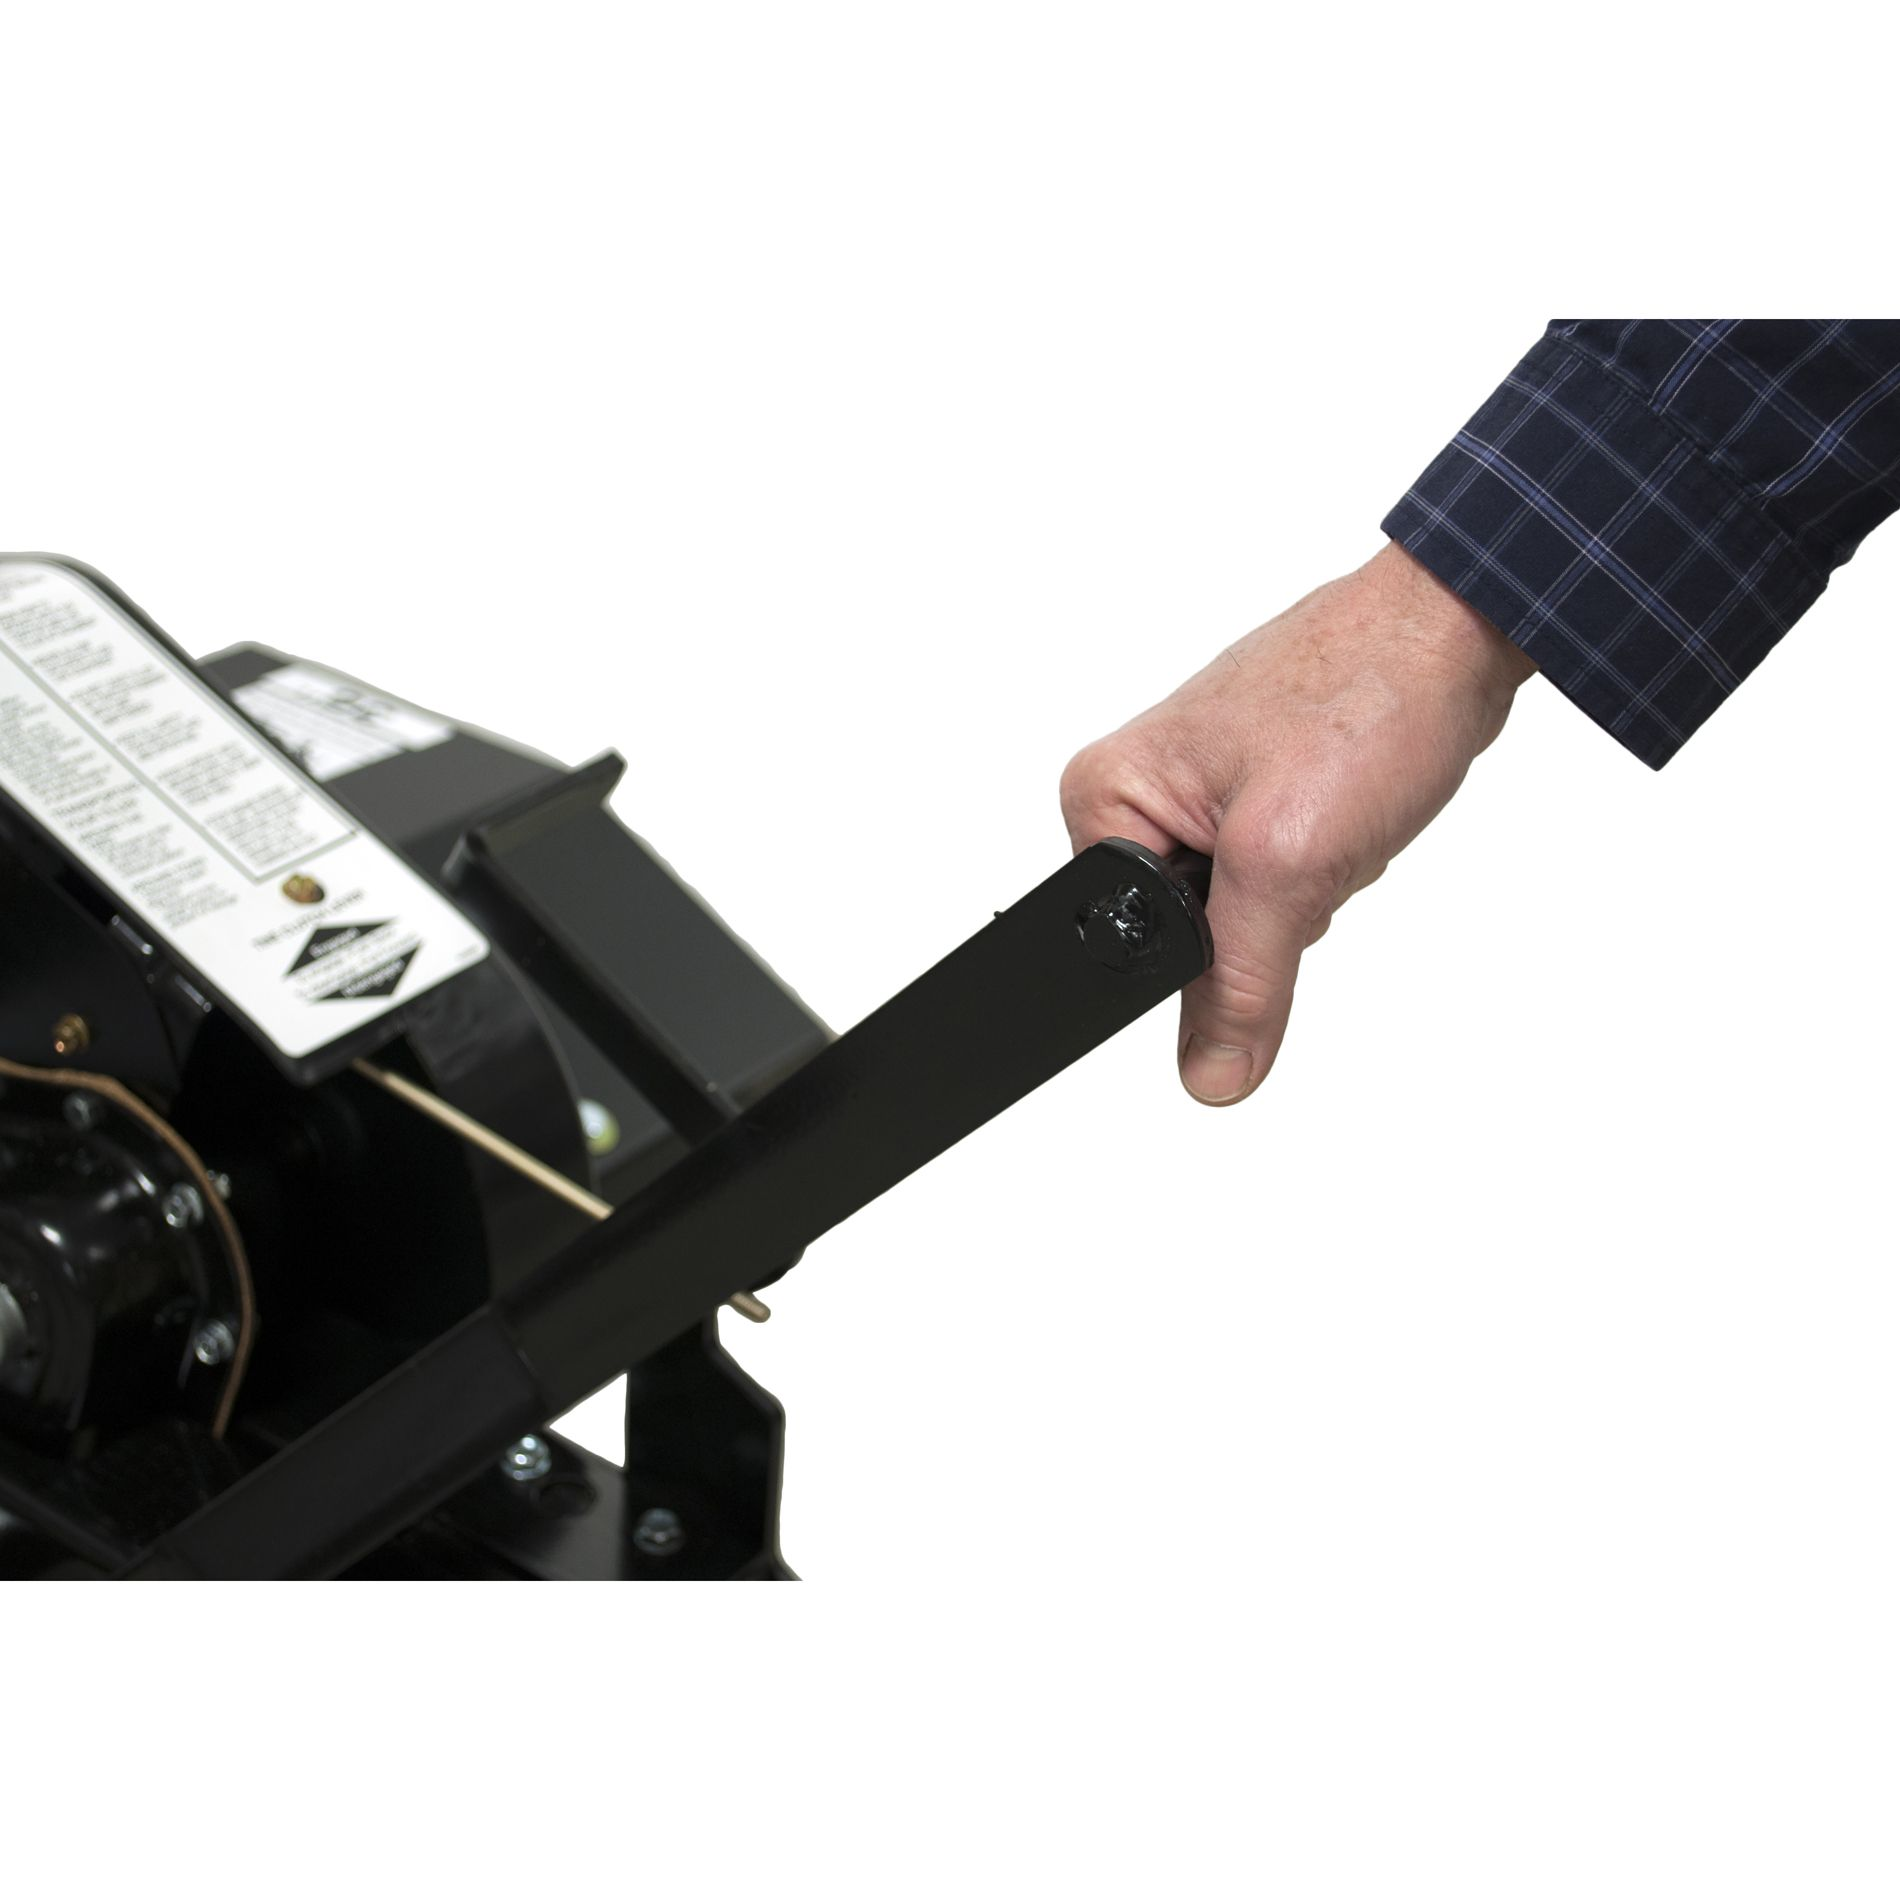 Craftsman Universal Tow-Mount Tiller